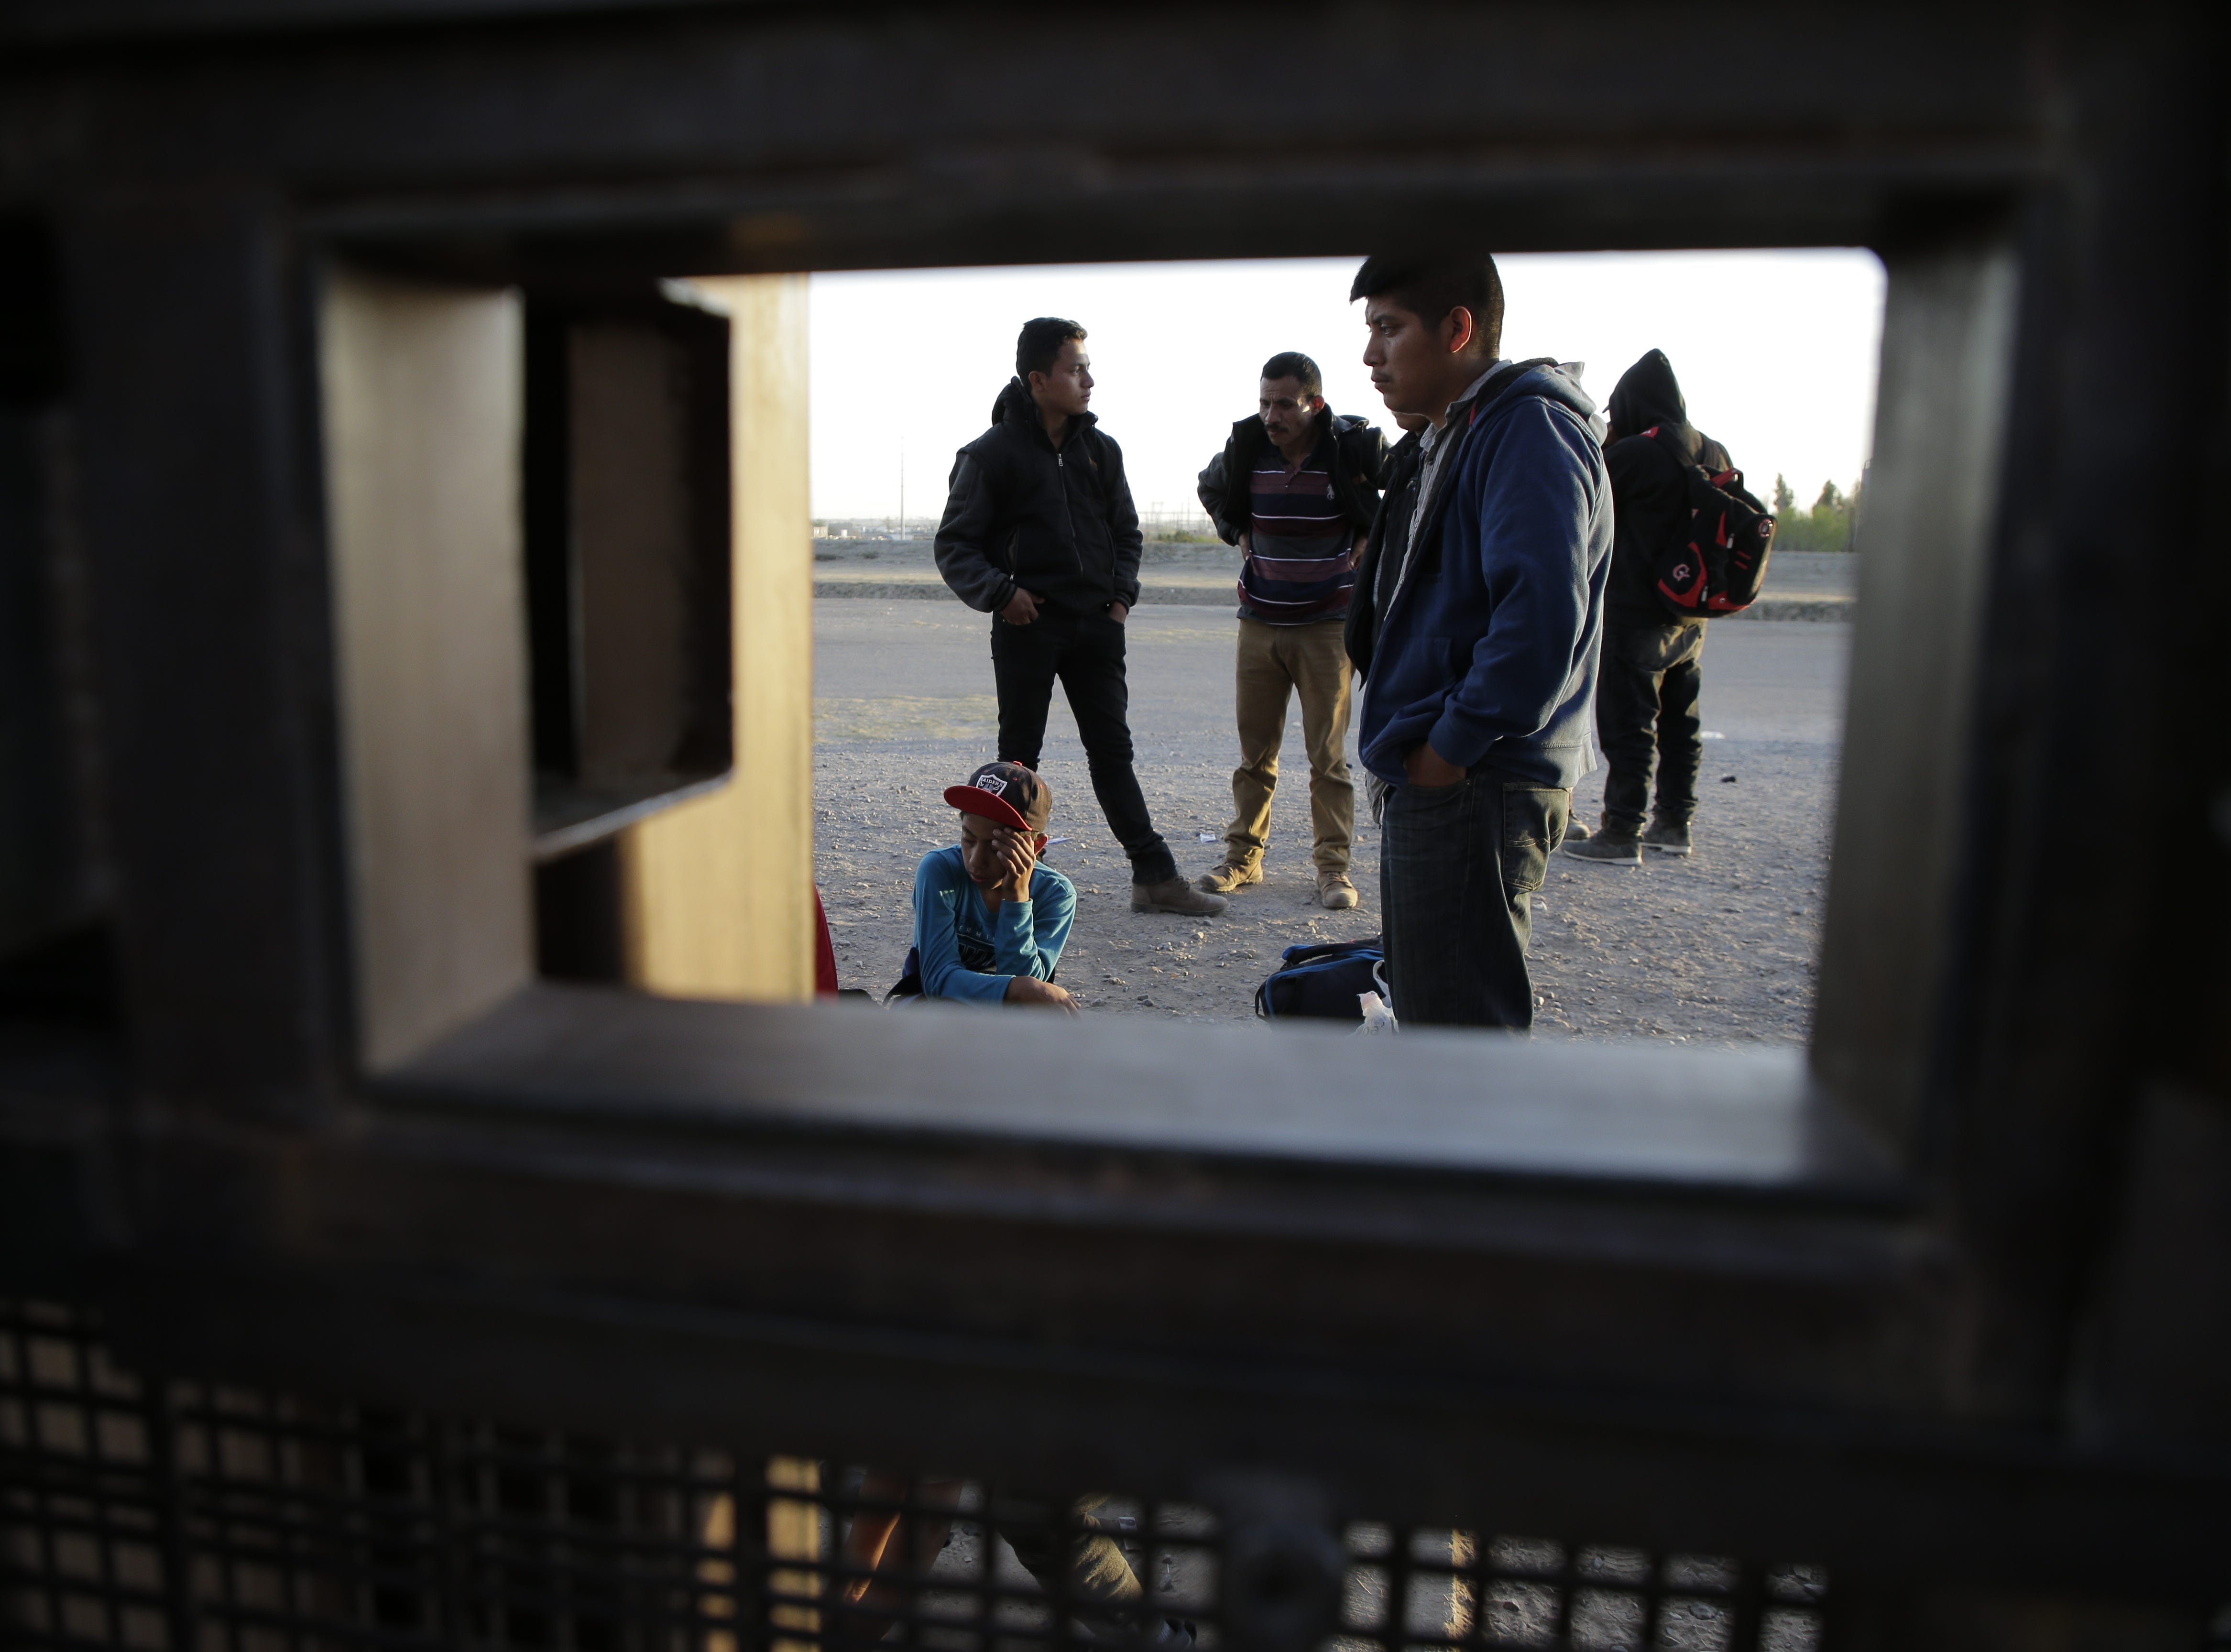 Migrants from Guatemala await Border Patrol at the U.S.-Mexico border in El Paso, Texas.